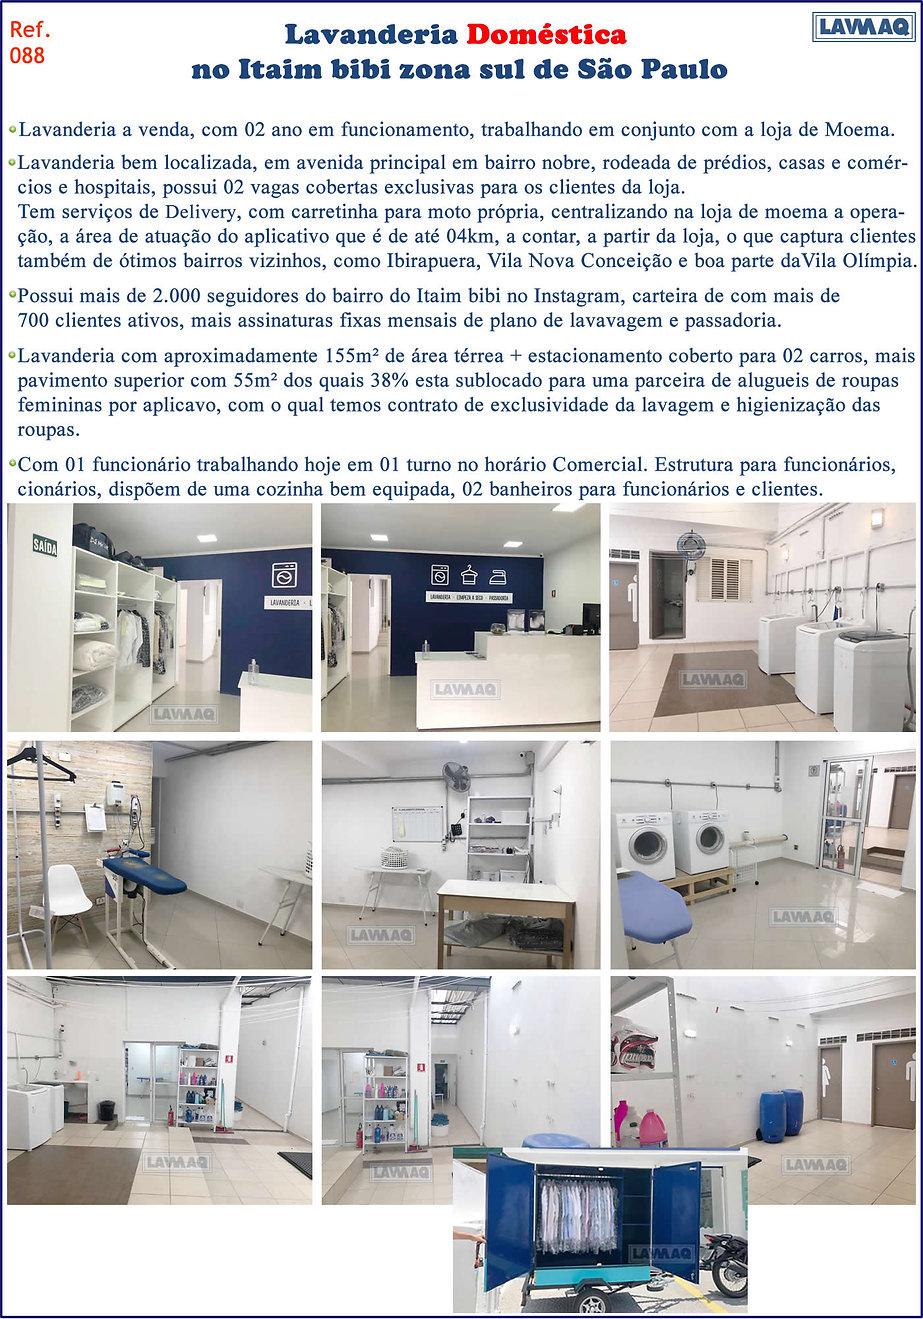 ref 088 Lavanderia domestica em Itaim bi